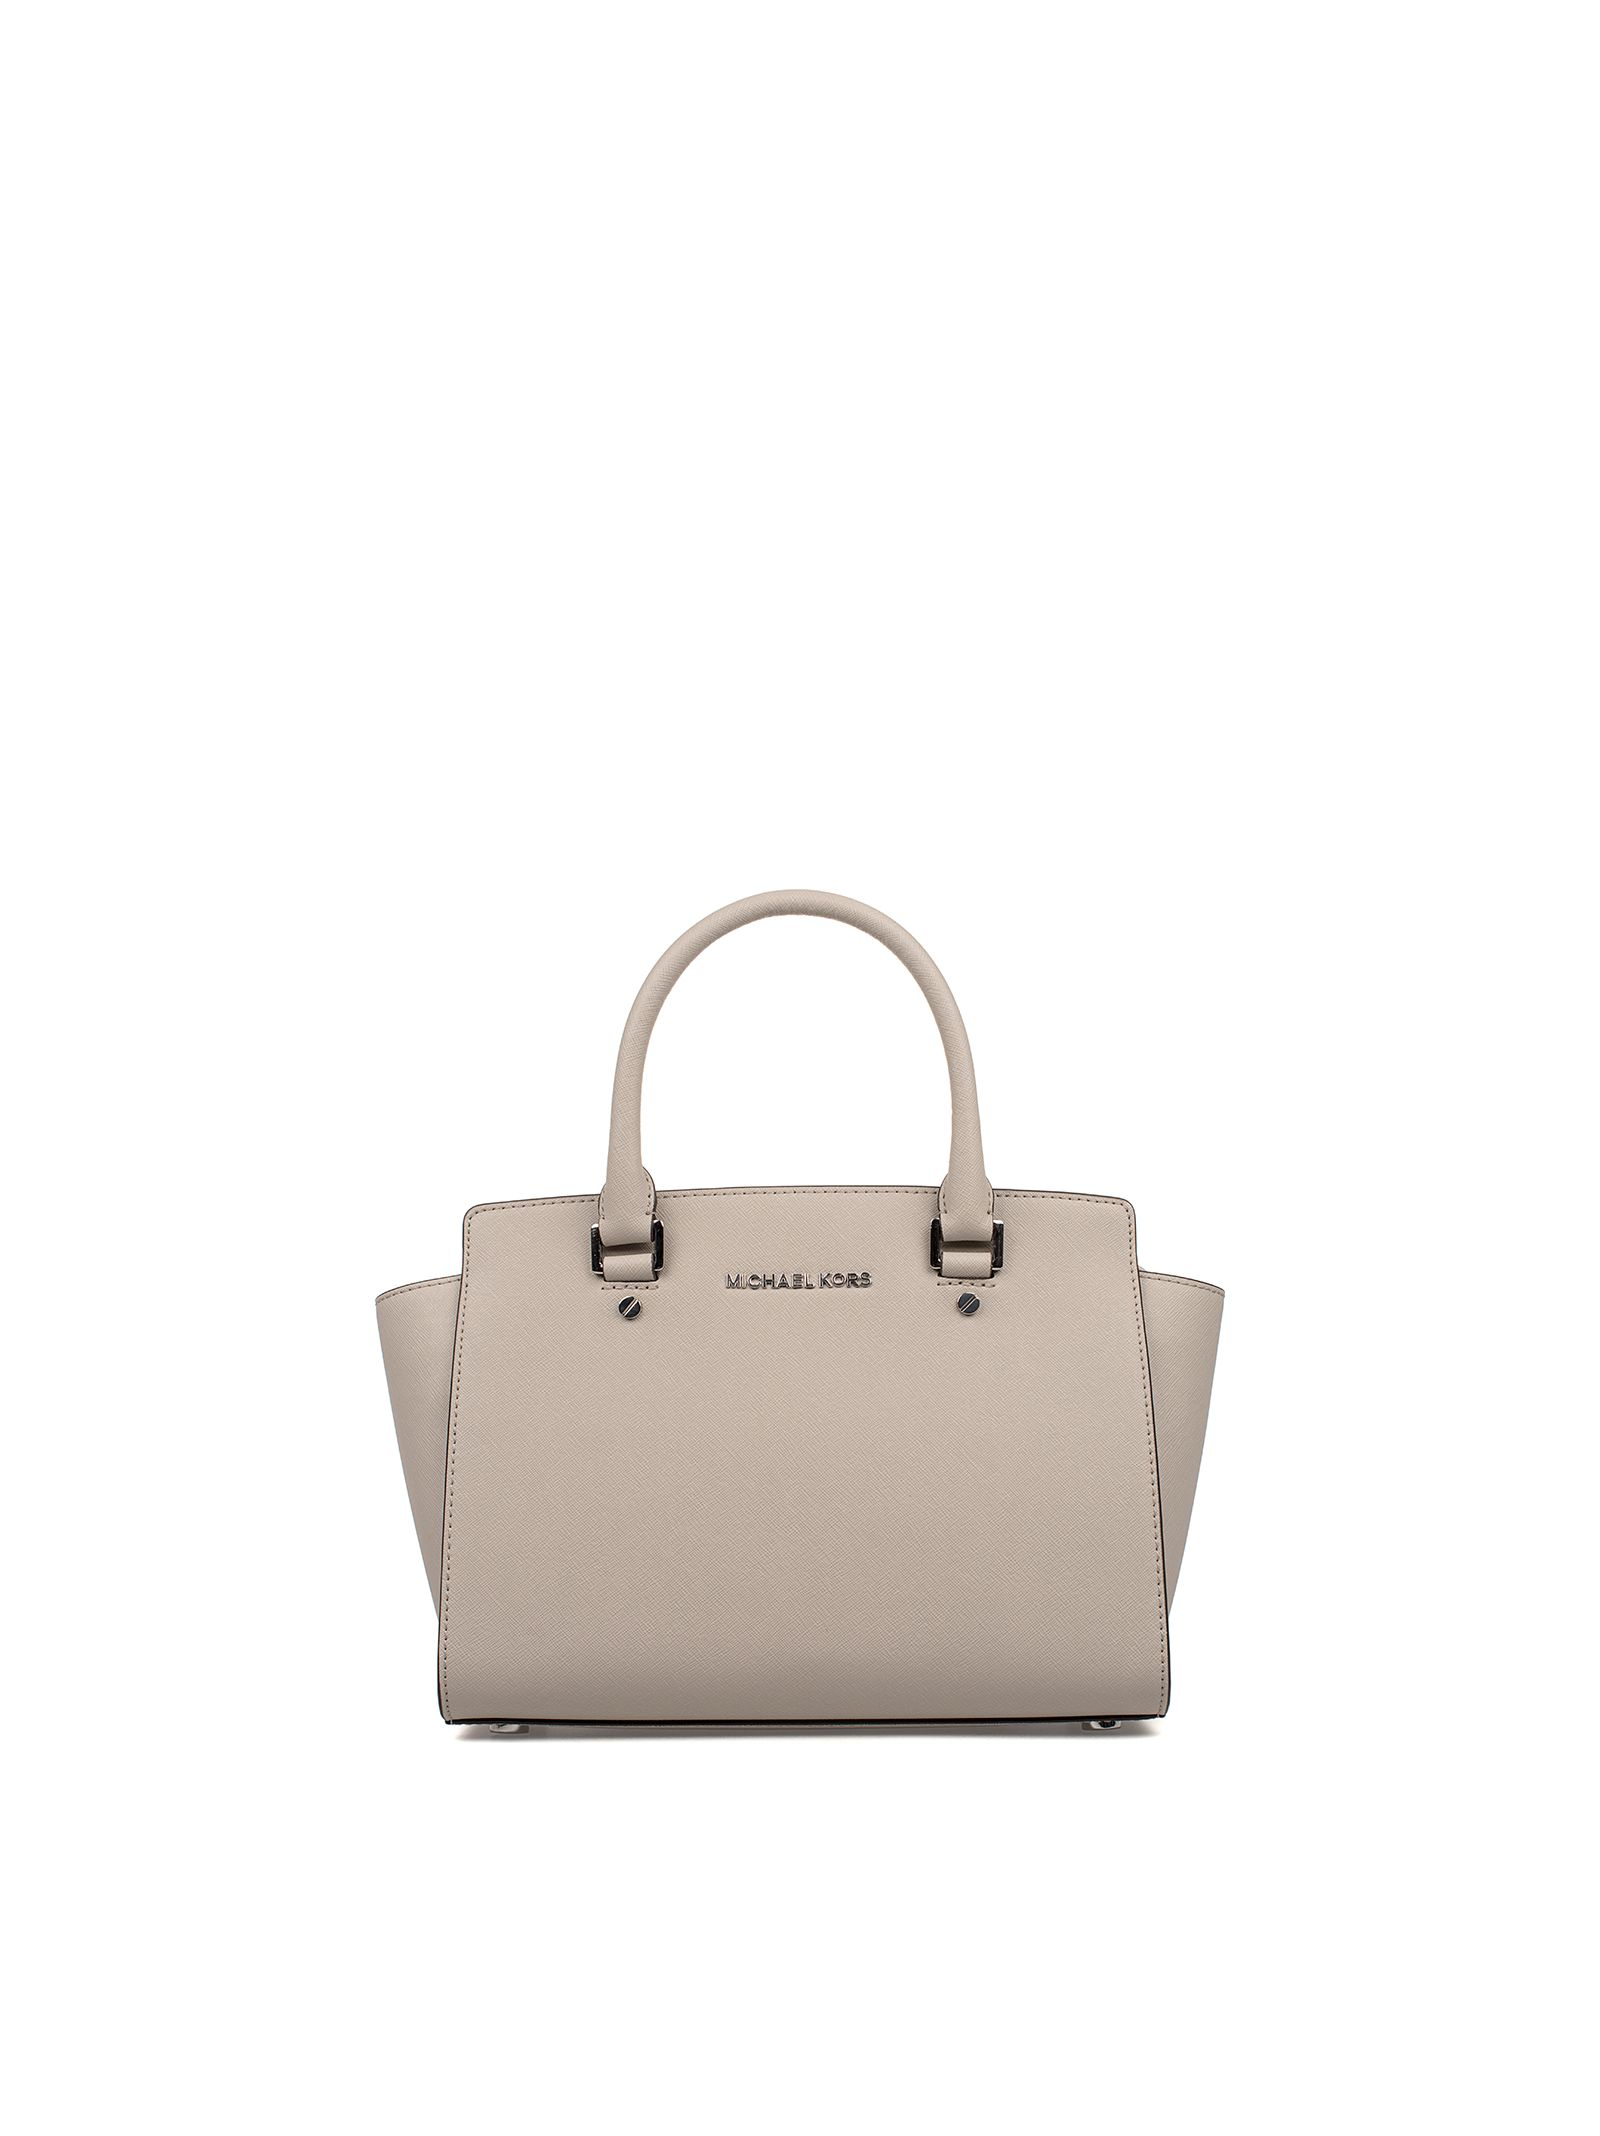 michael kors female cement medium selma seatchel saffiano leather top handle bag